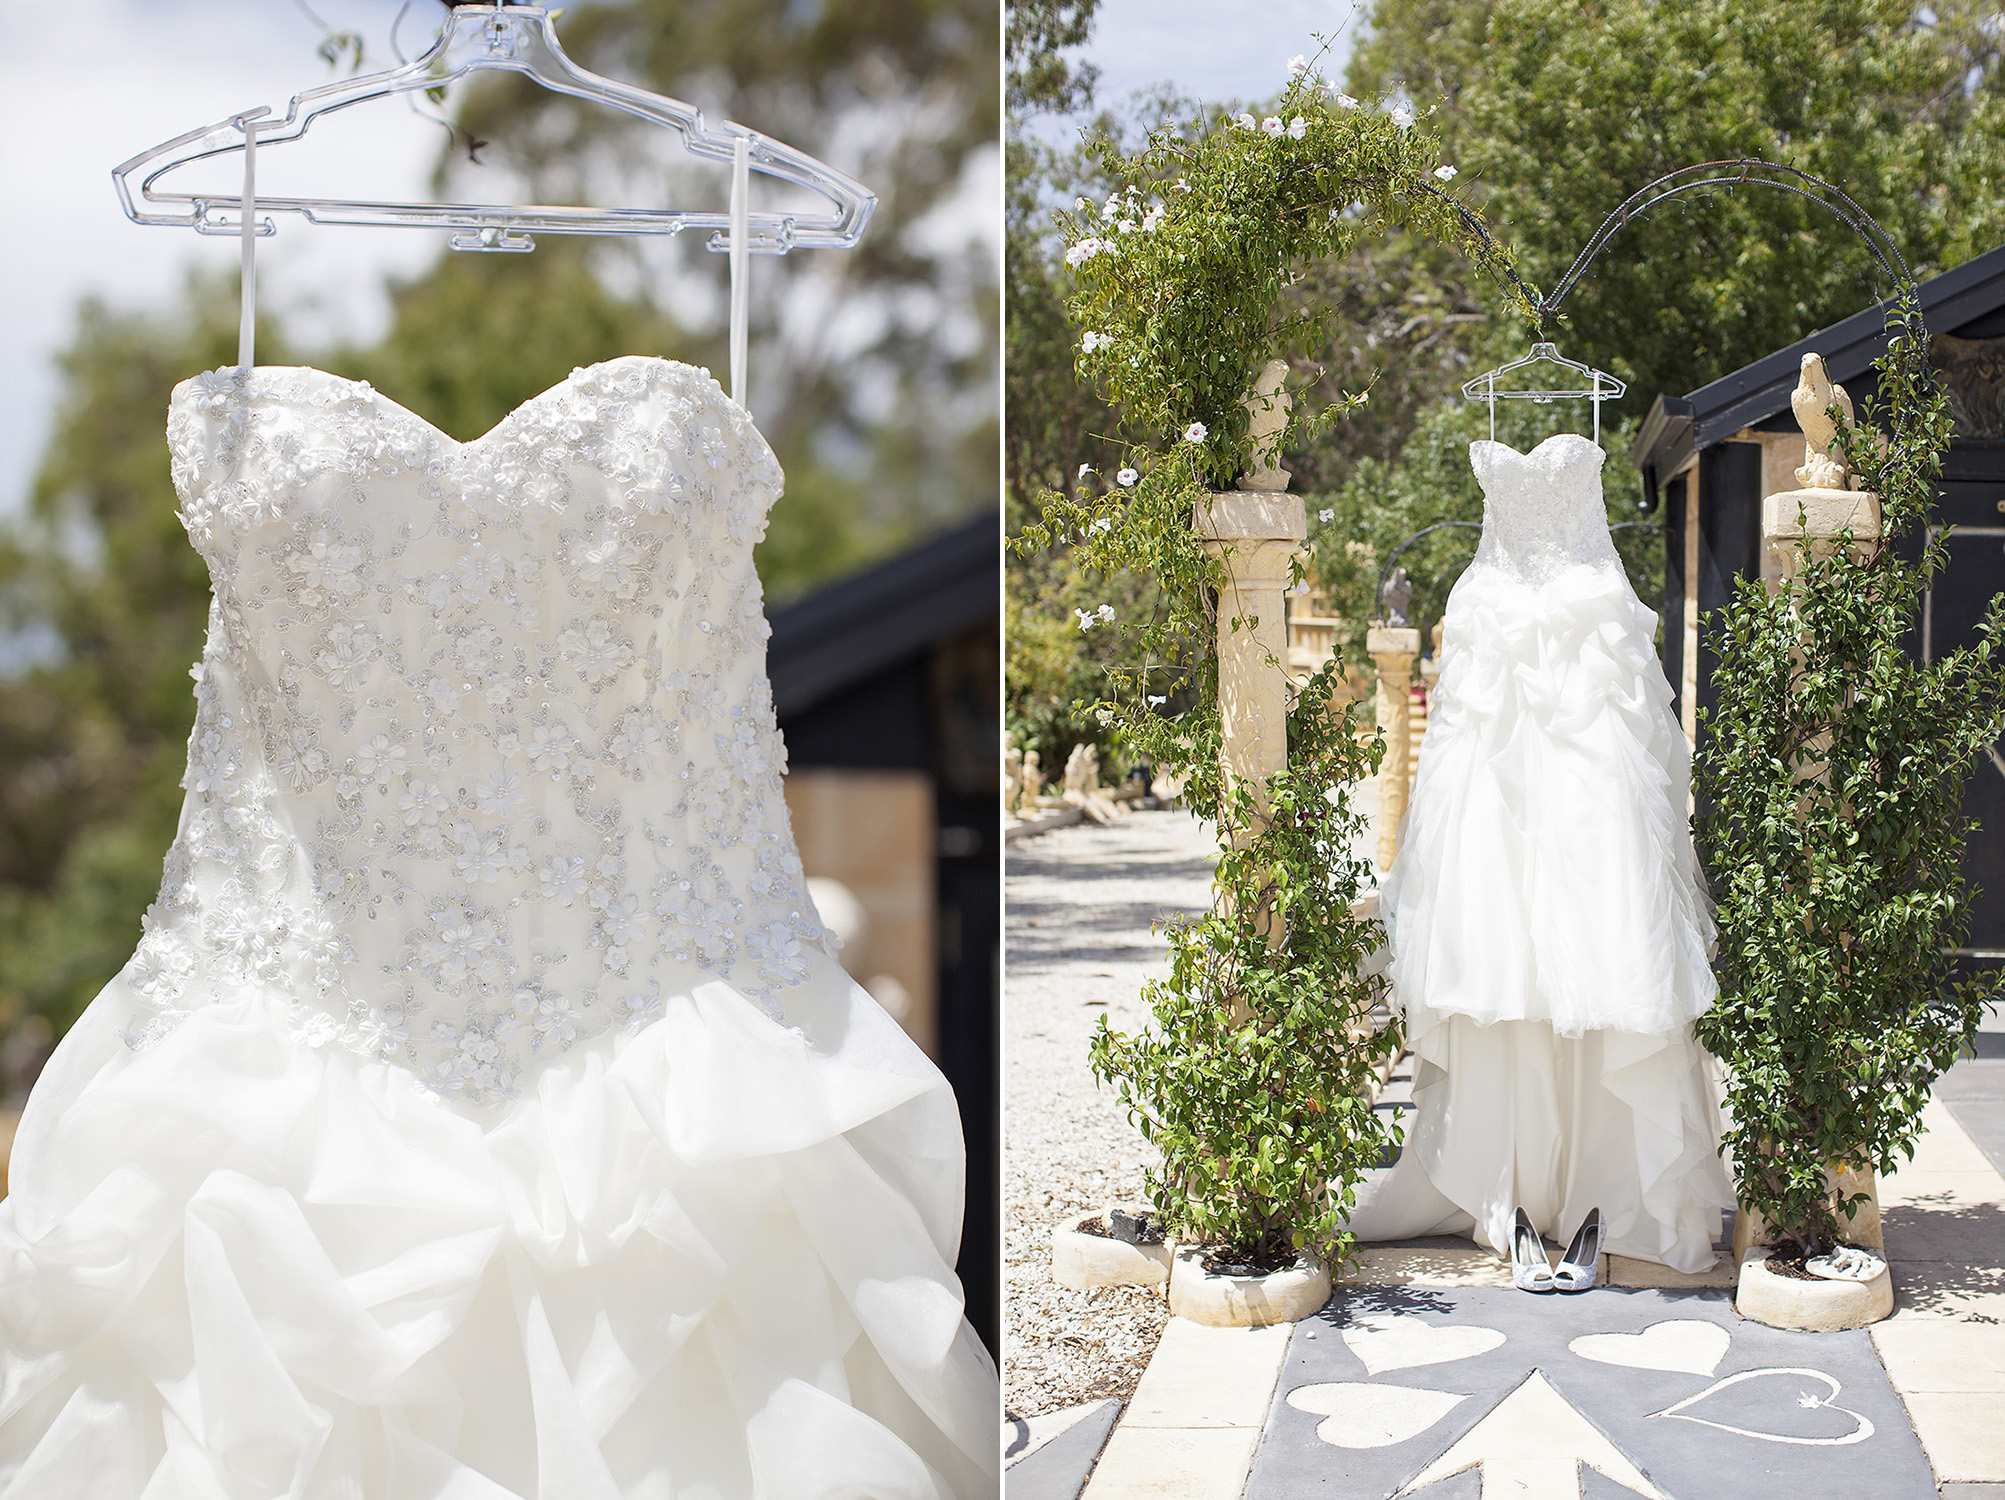 One Tree Hill Wedding Photography Art Through Da Vinces Eyes 01.jpg